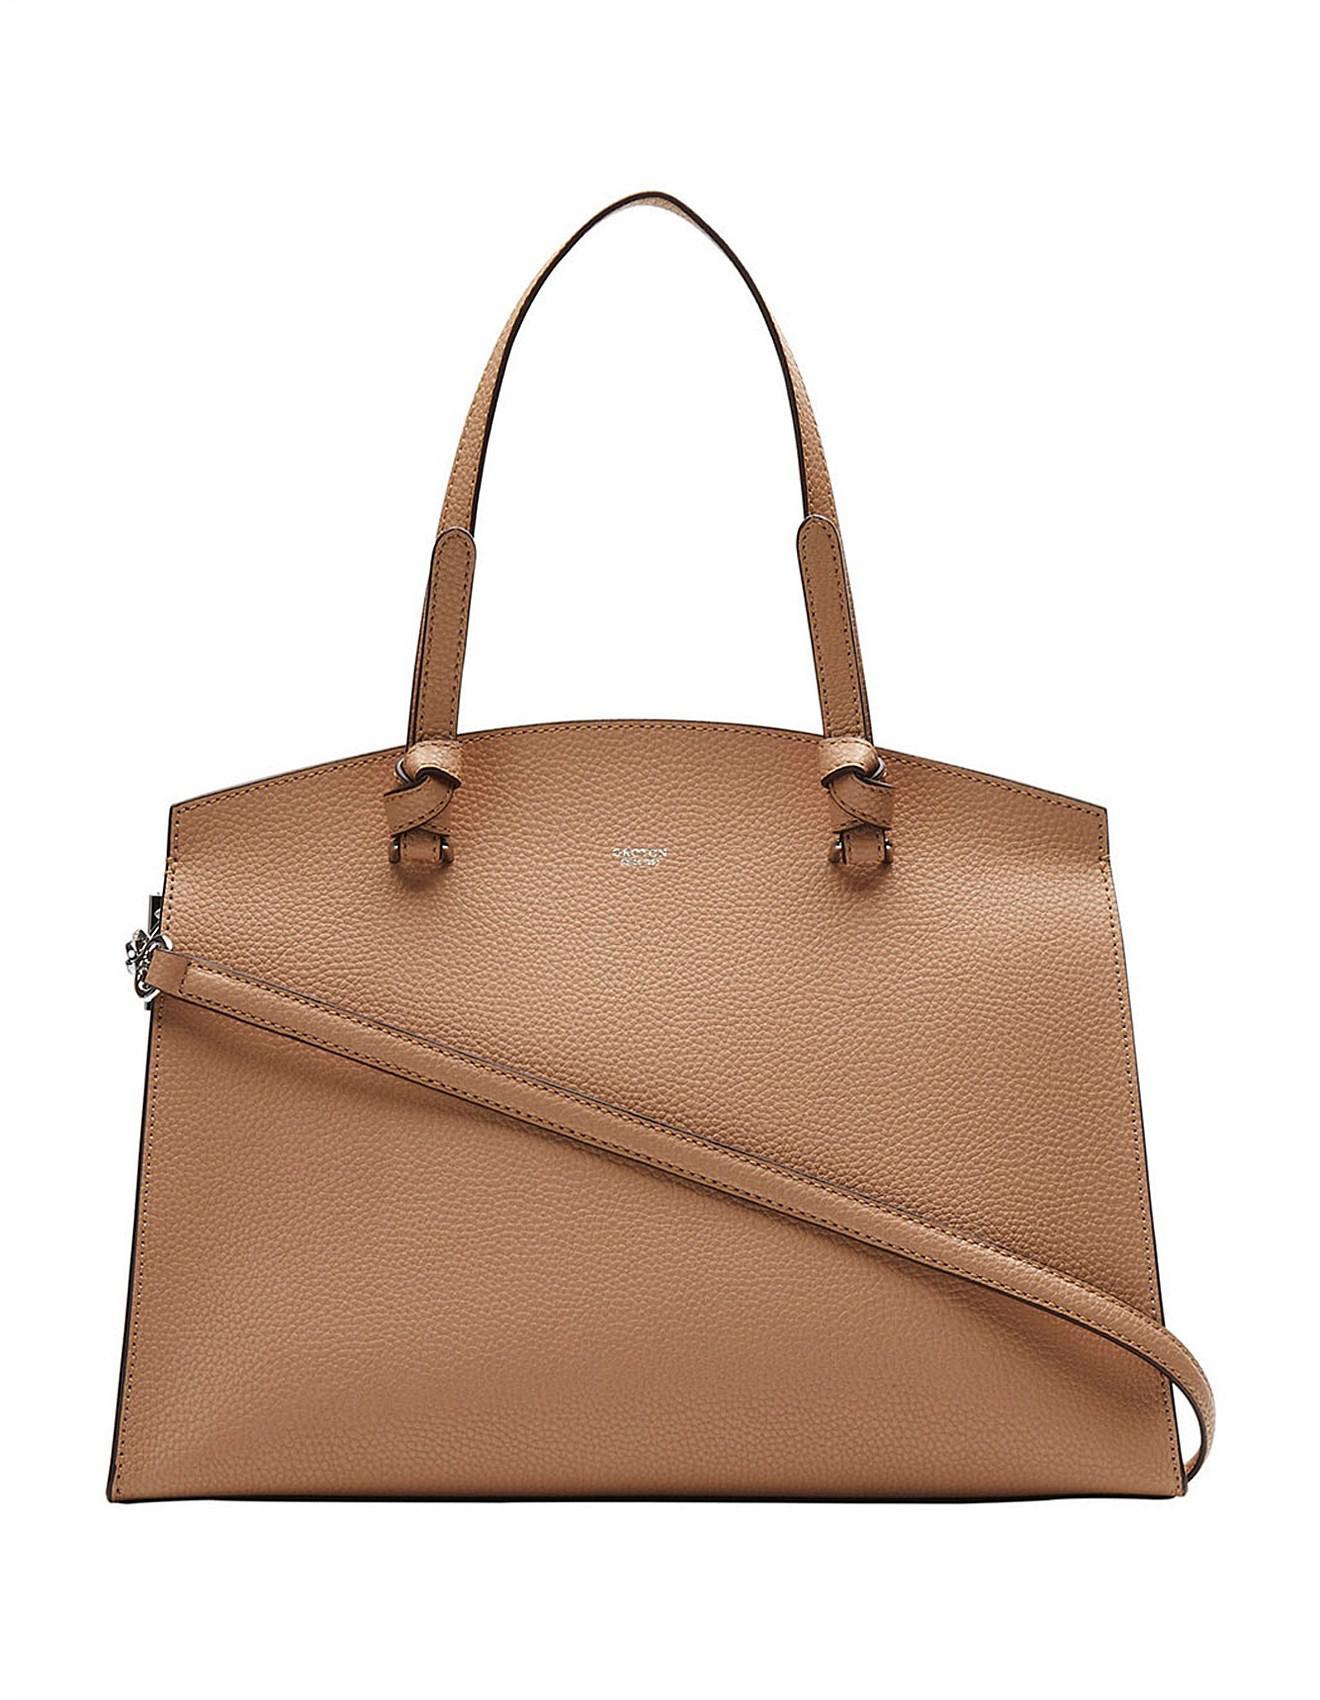 151a1dba525b Oroton. Women s Atlas Day Bag